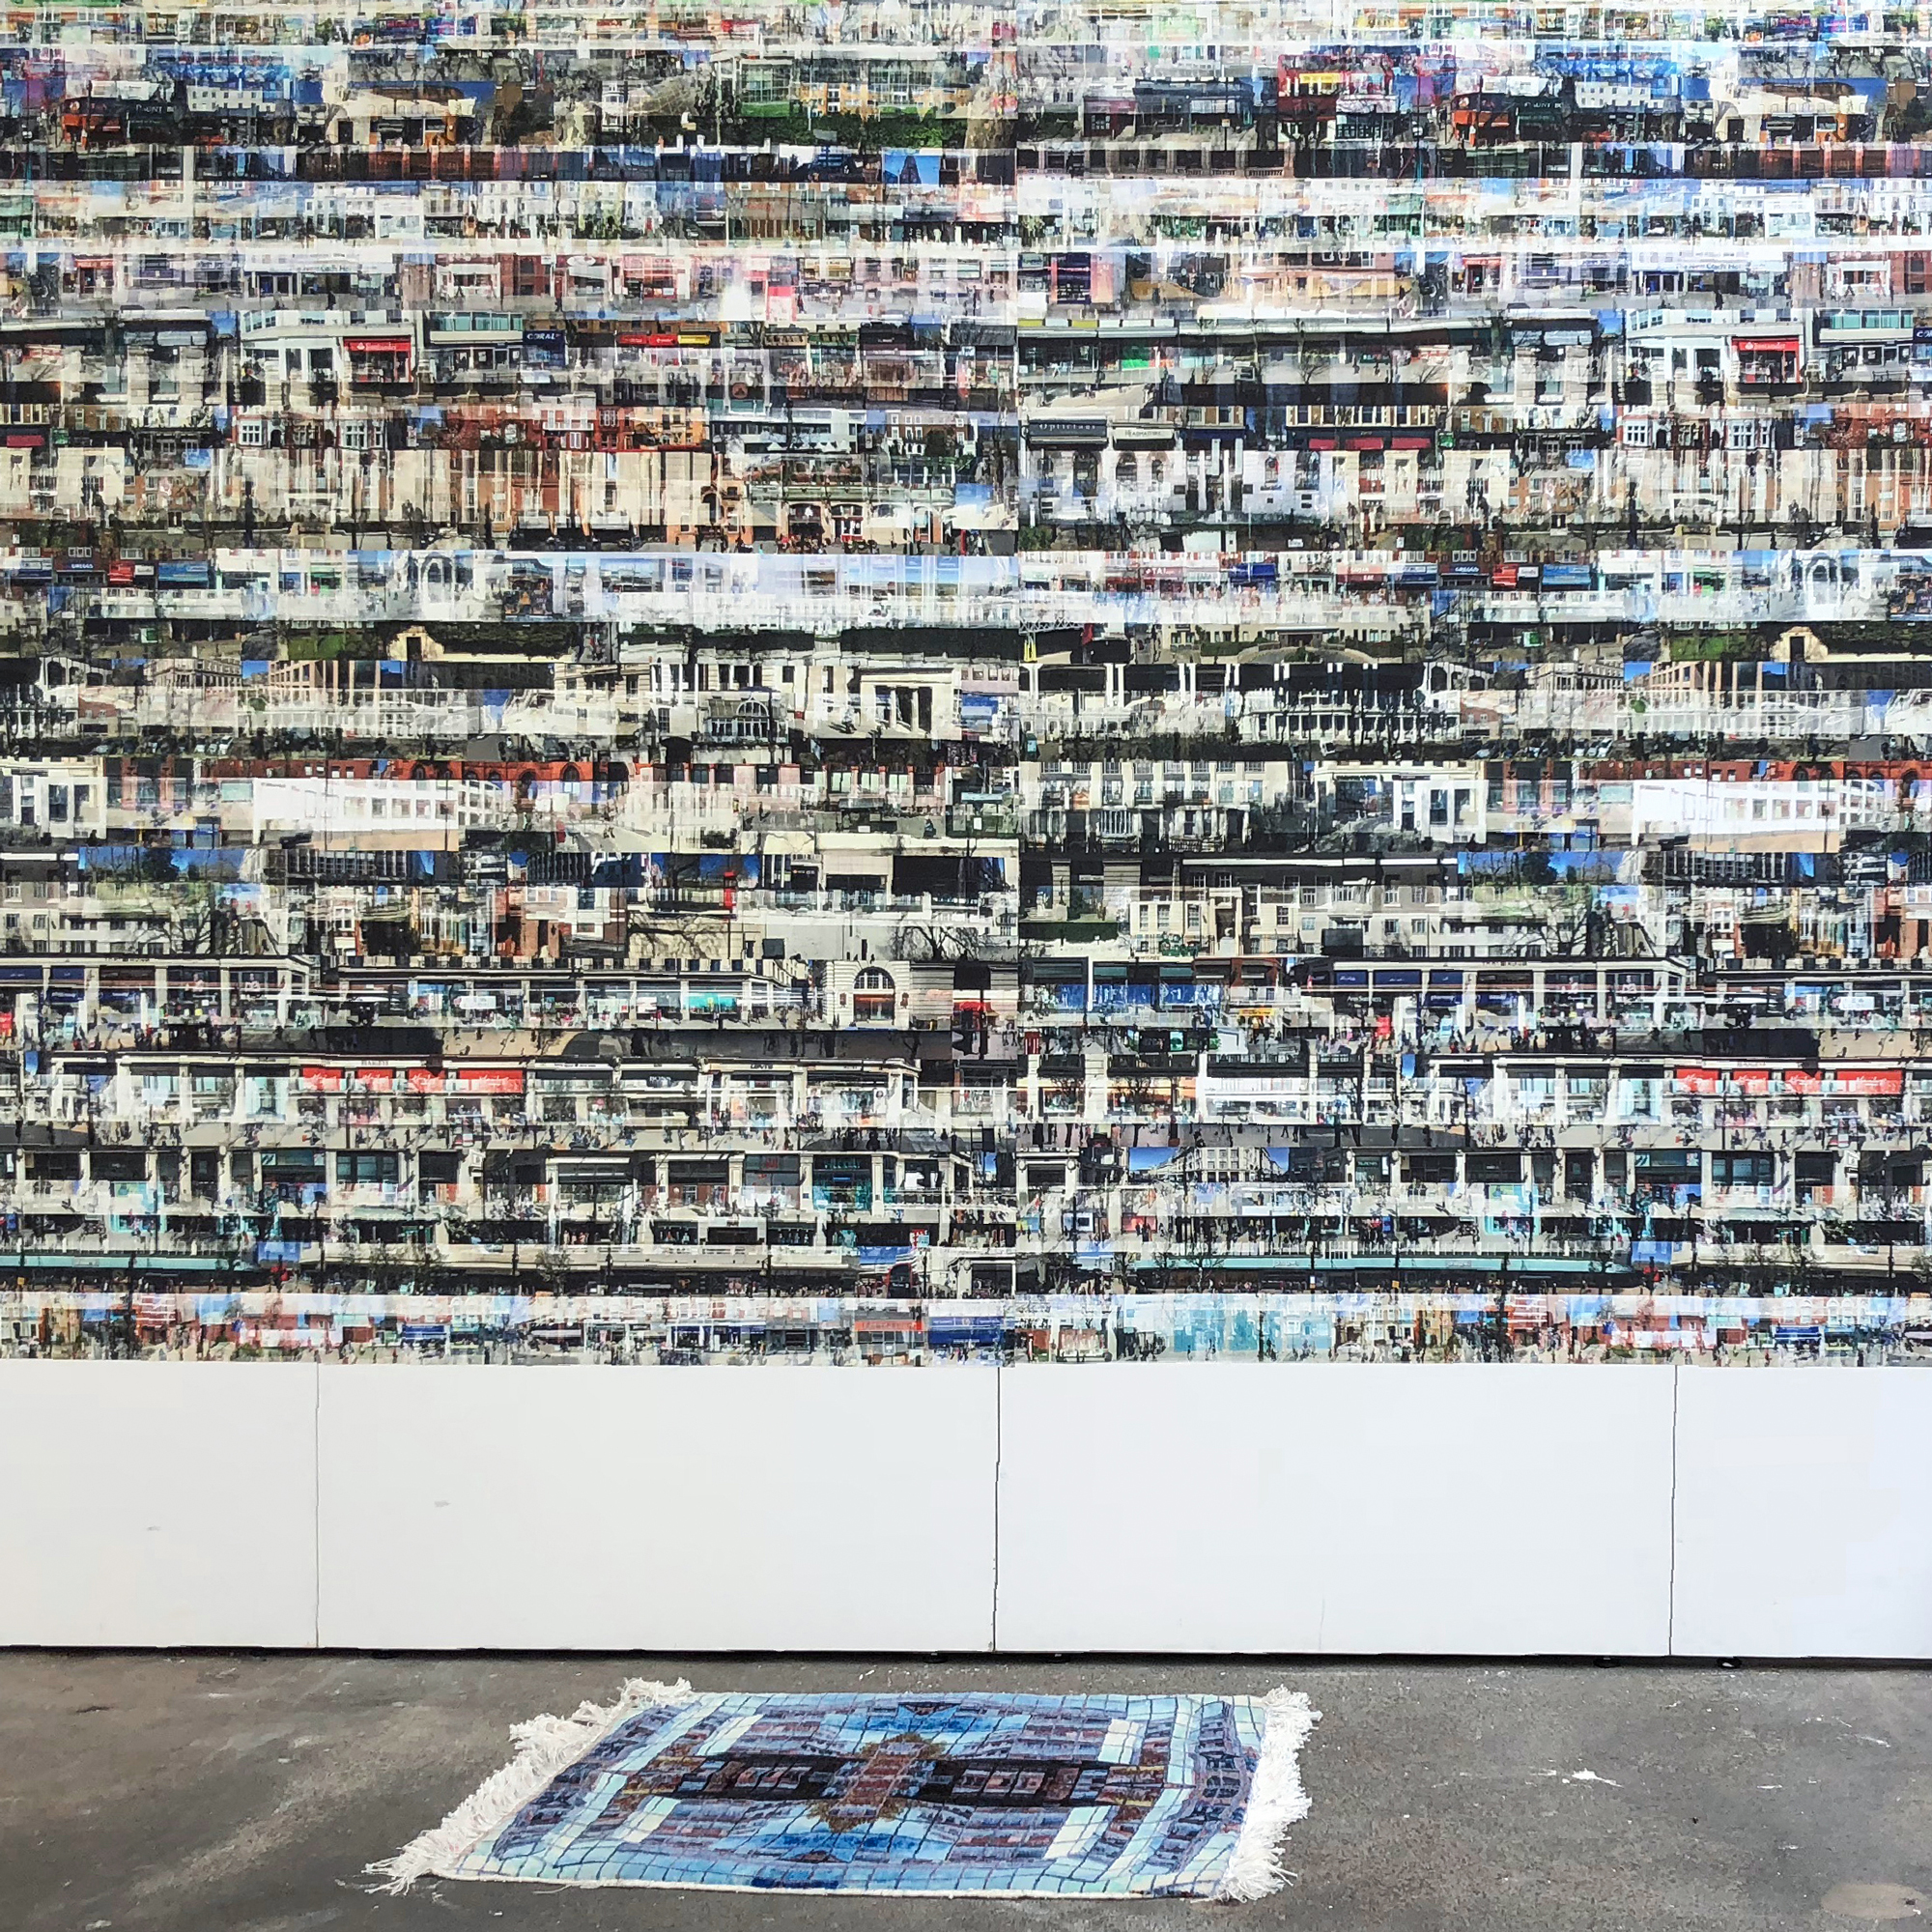 AmirBECH-RubikSpace-FreeRangeShows-TheOldTrumanBrewery-2018.jpg